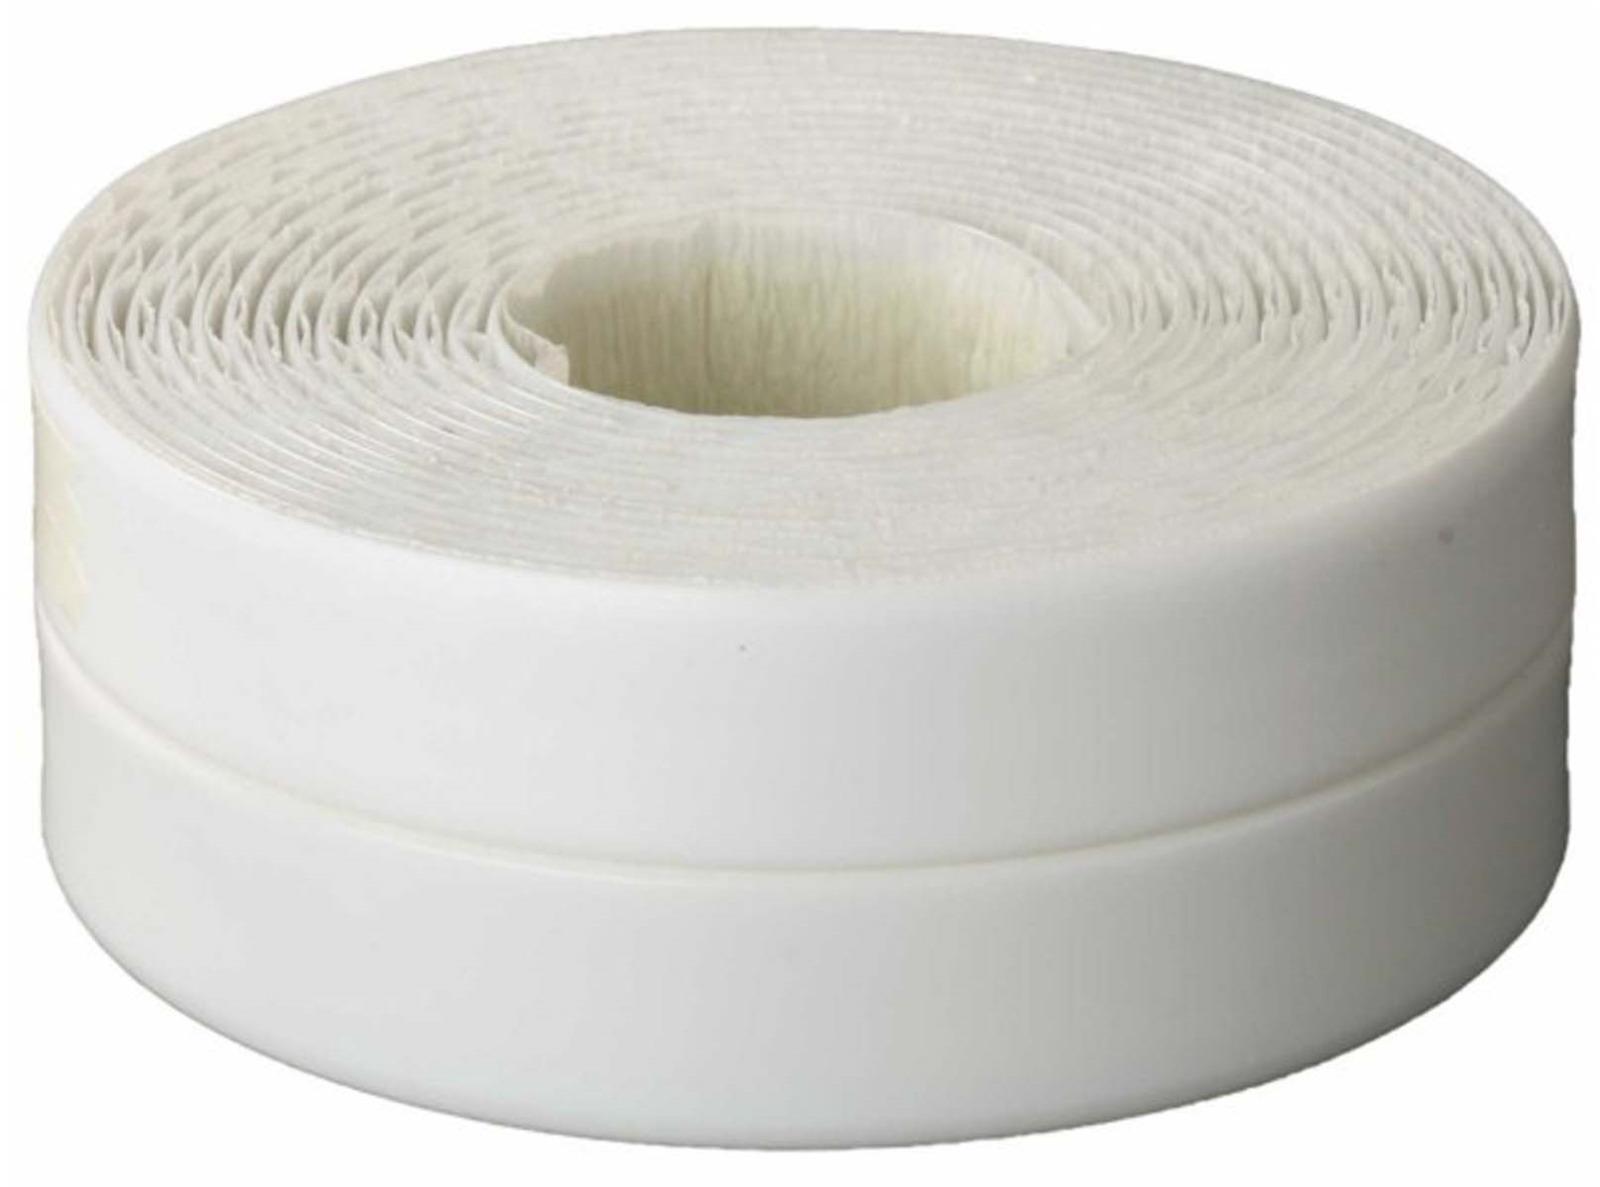 Лента бордюрная MasterProf, герметик, 60 мм, уп.3.35 м, цвет: белый световозвращающая лента oralite reflexite vc104 tanker stickers для жесткого борта для цистерн белая 50 м